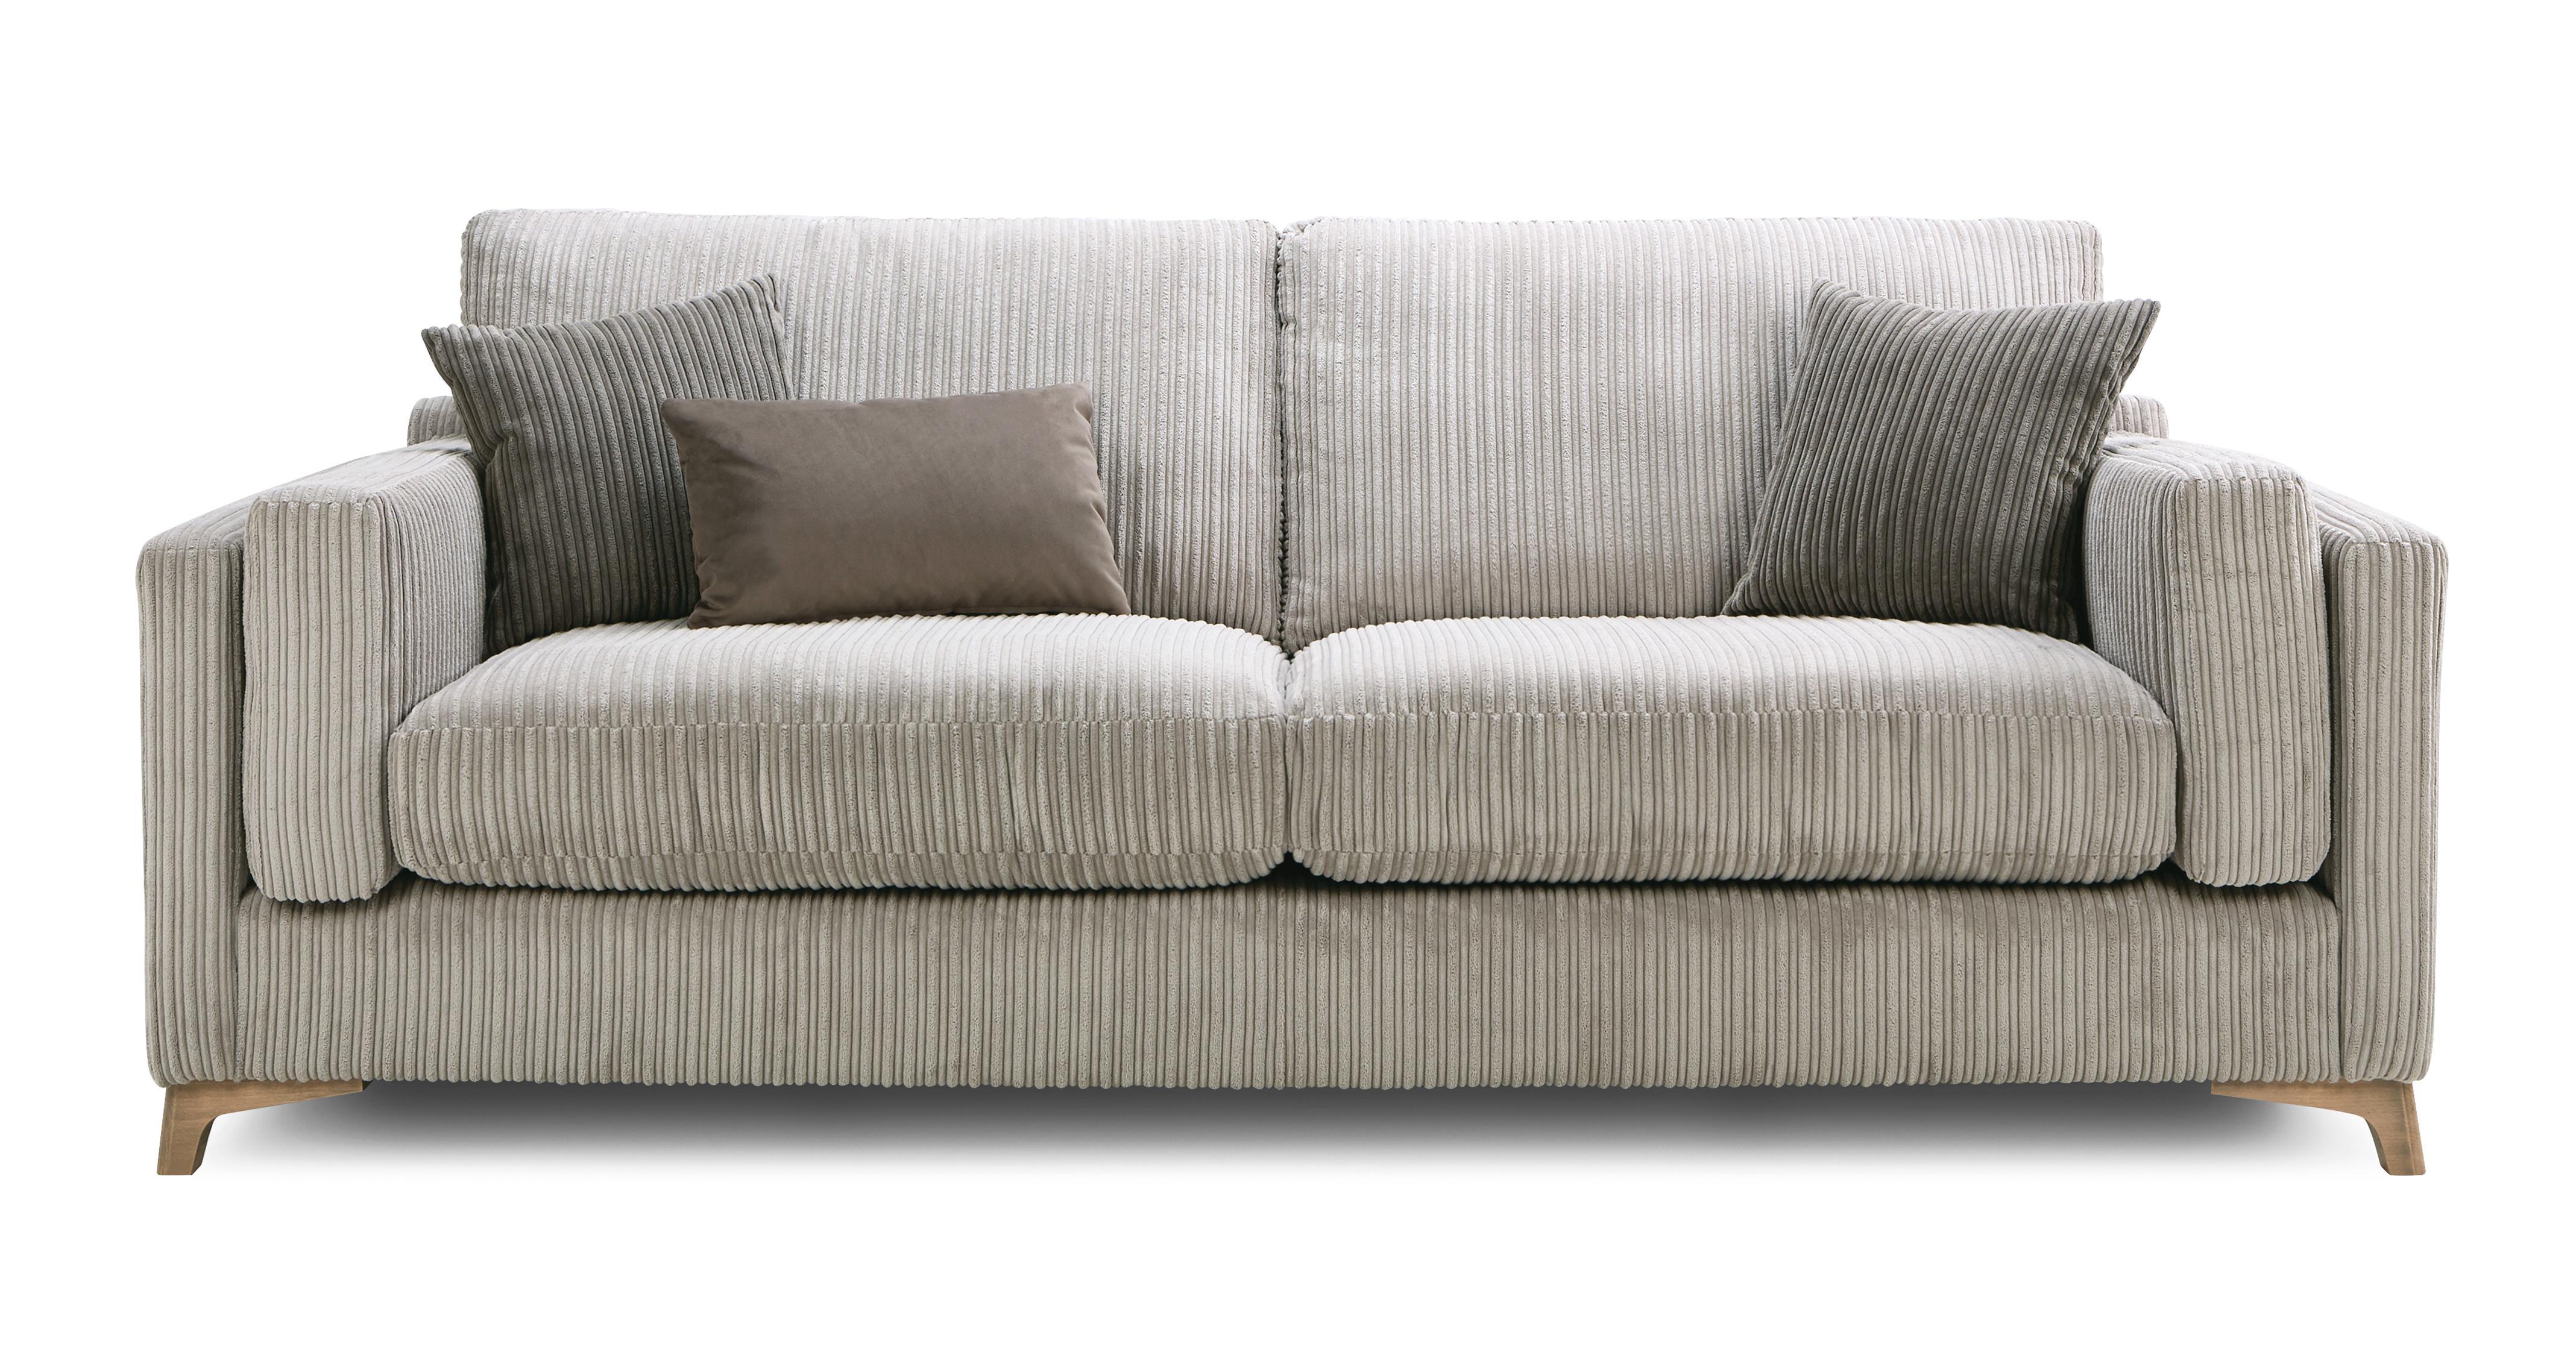 nimbus 4 seater sofa dfs. Black Bedroom Furniture Sets. Home Design Ideas